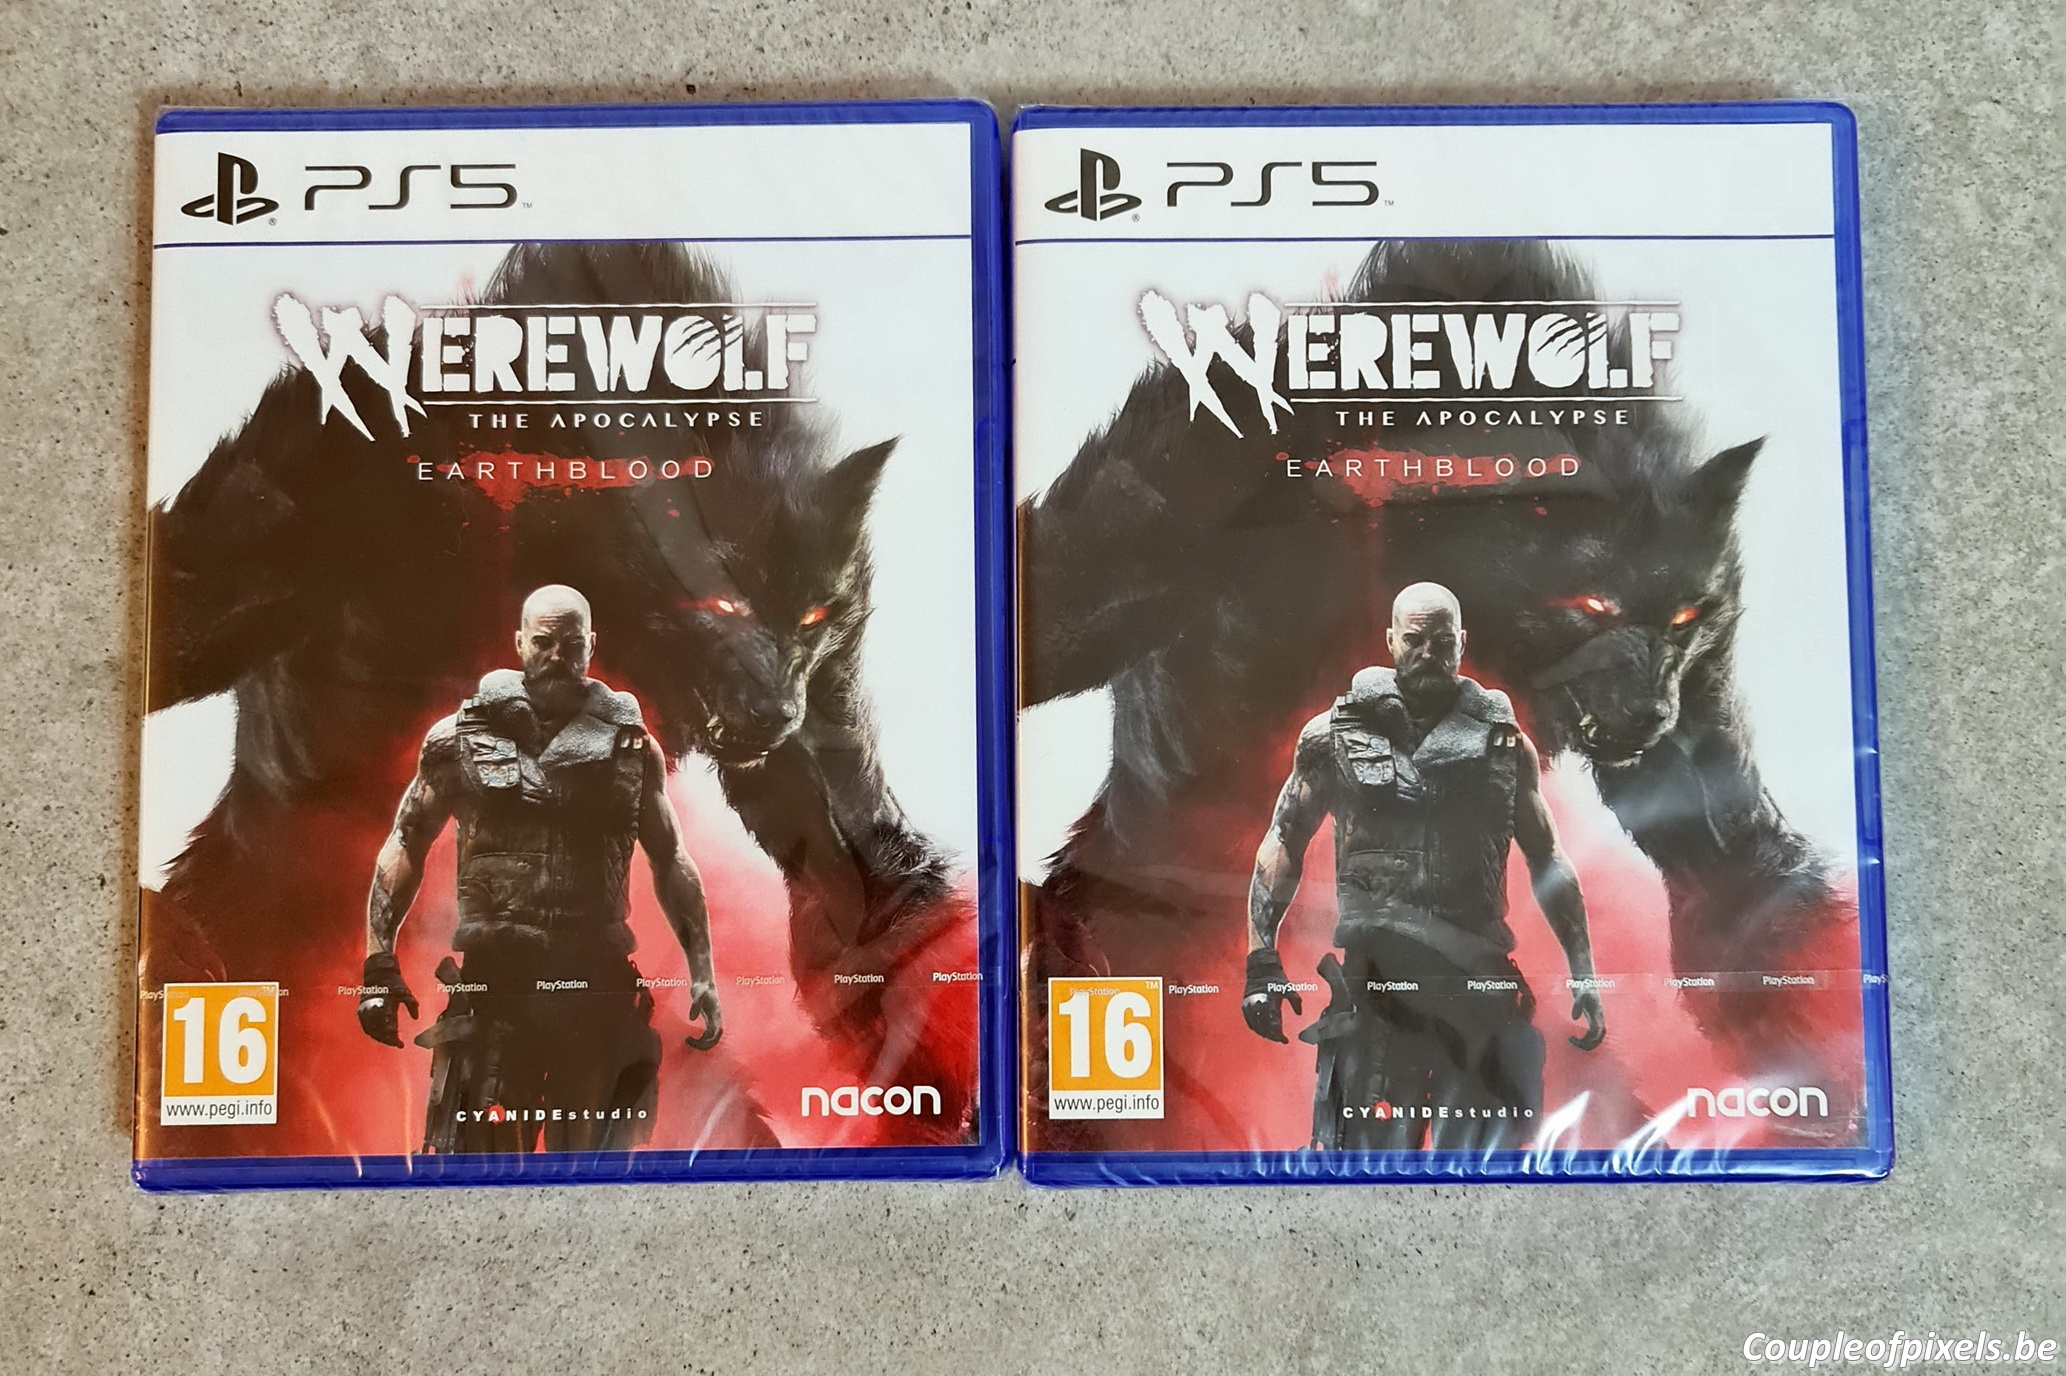 Werewolf the apocalypse Earthblood - concours